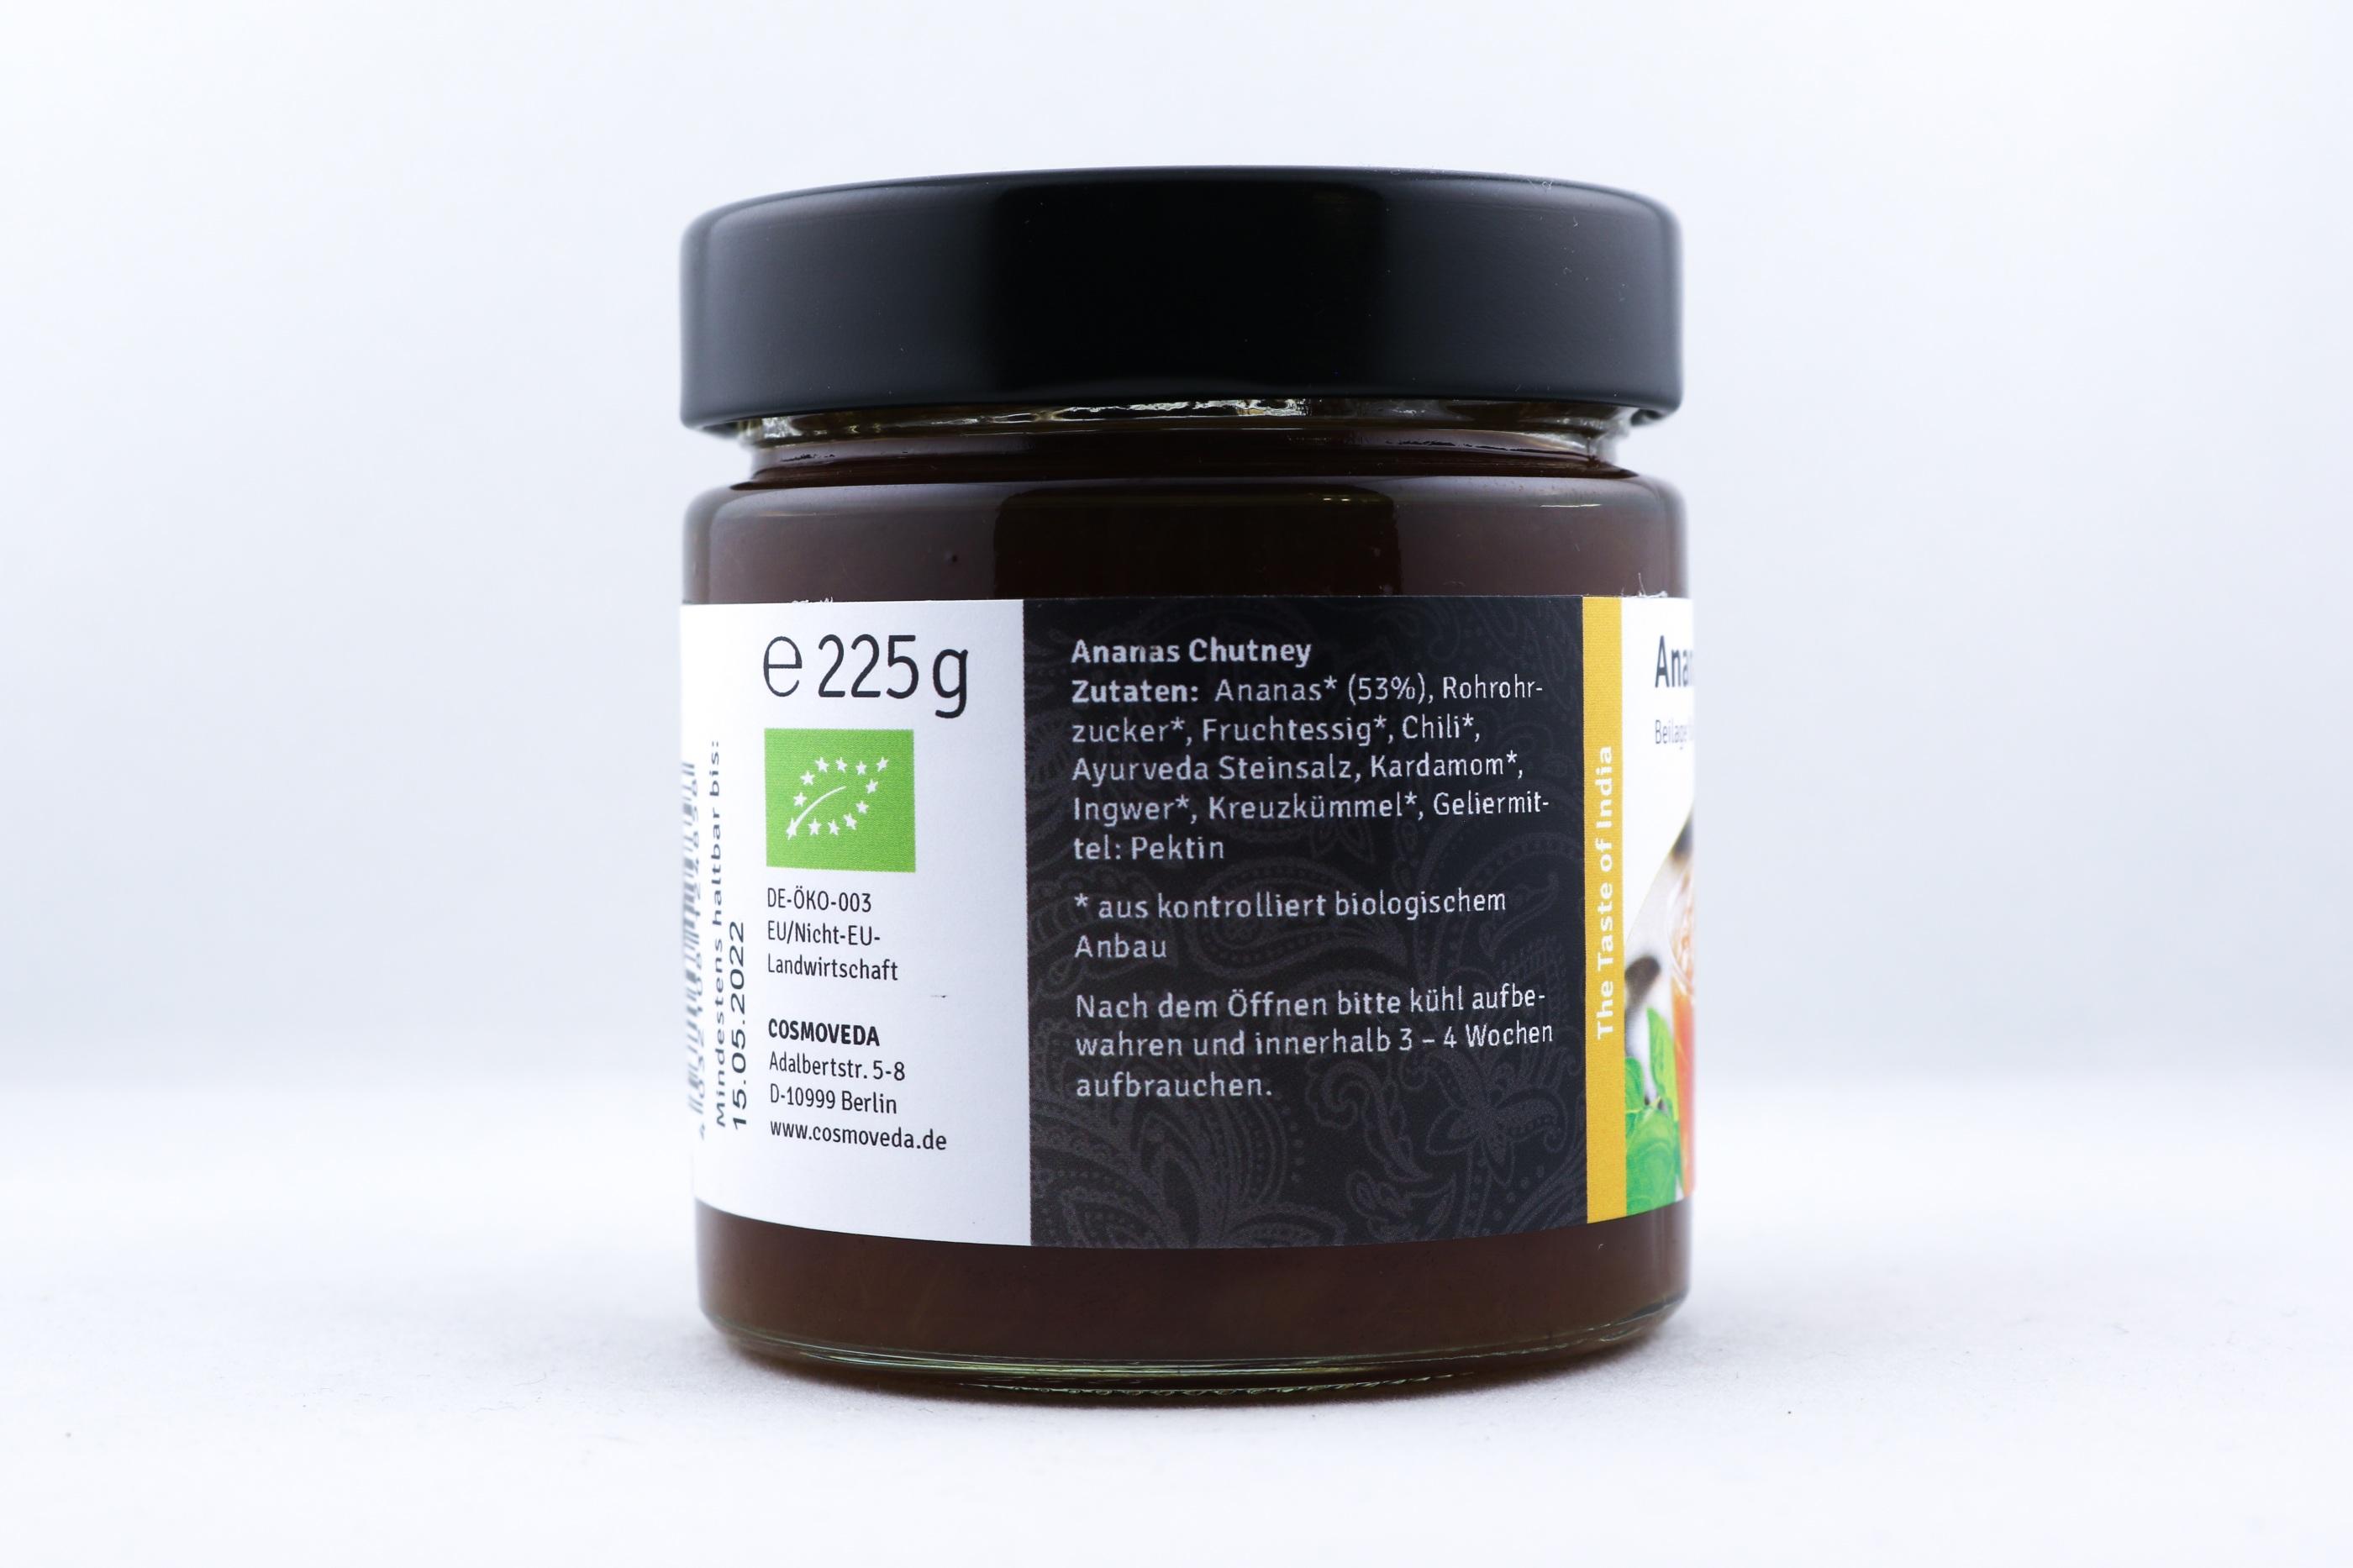 Ananas Chutney Wellness Ayurveda Halmstadmassören Halmstad Sverige Sweden svensk sött mat eko ekologiskt